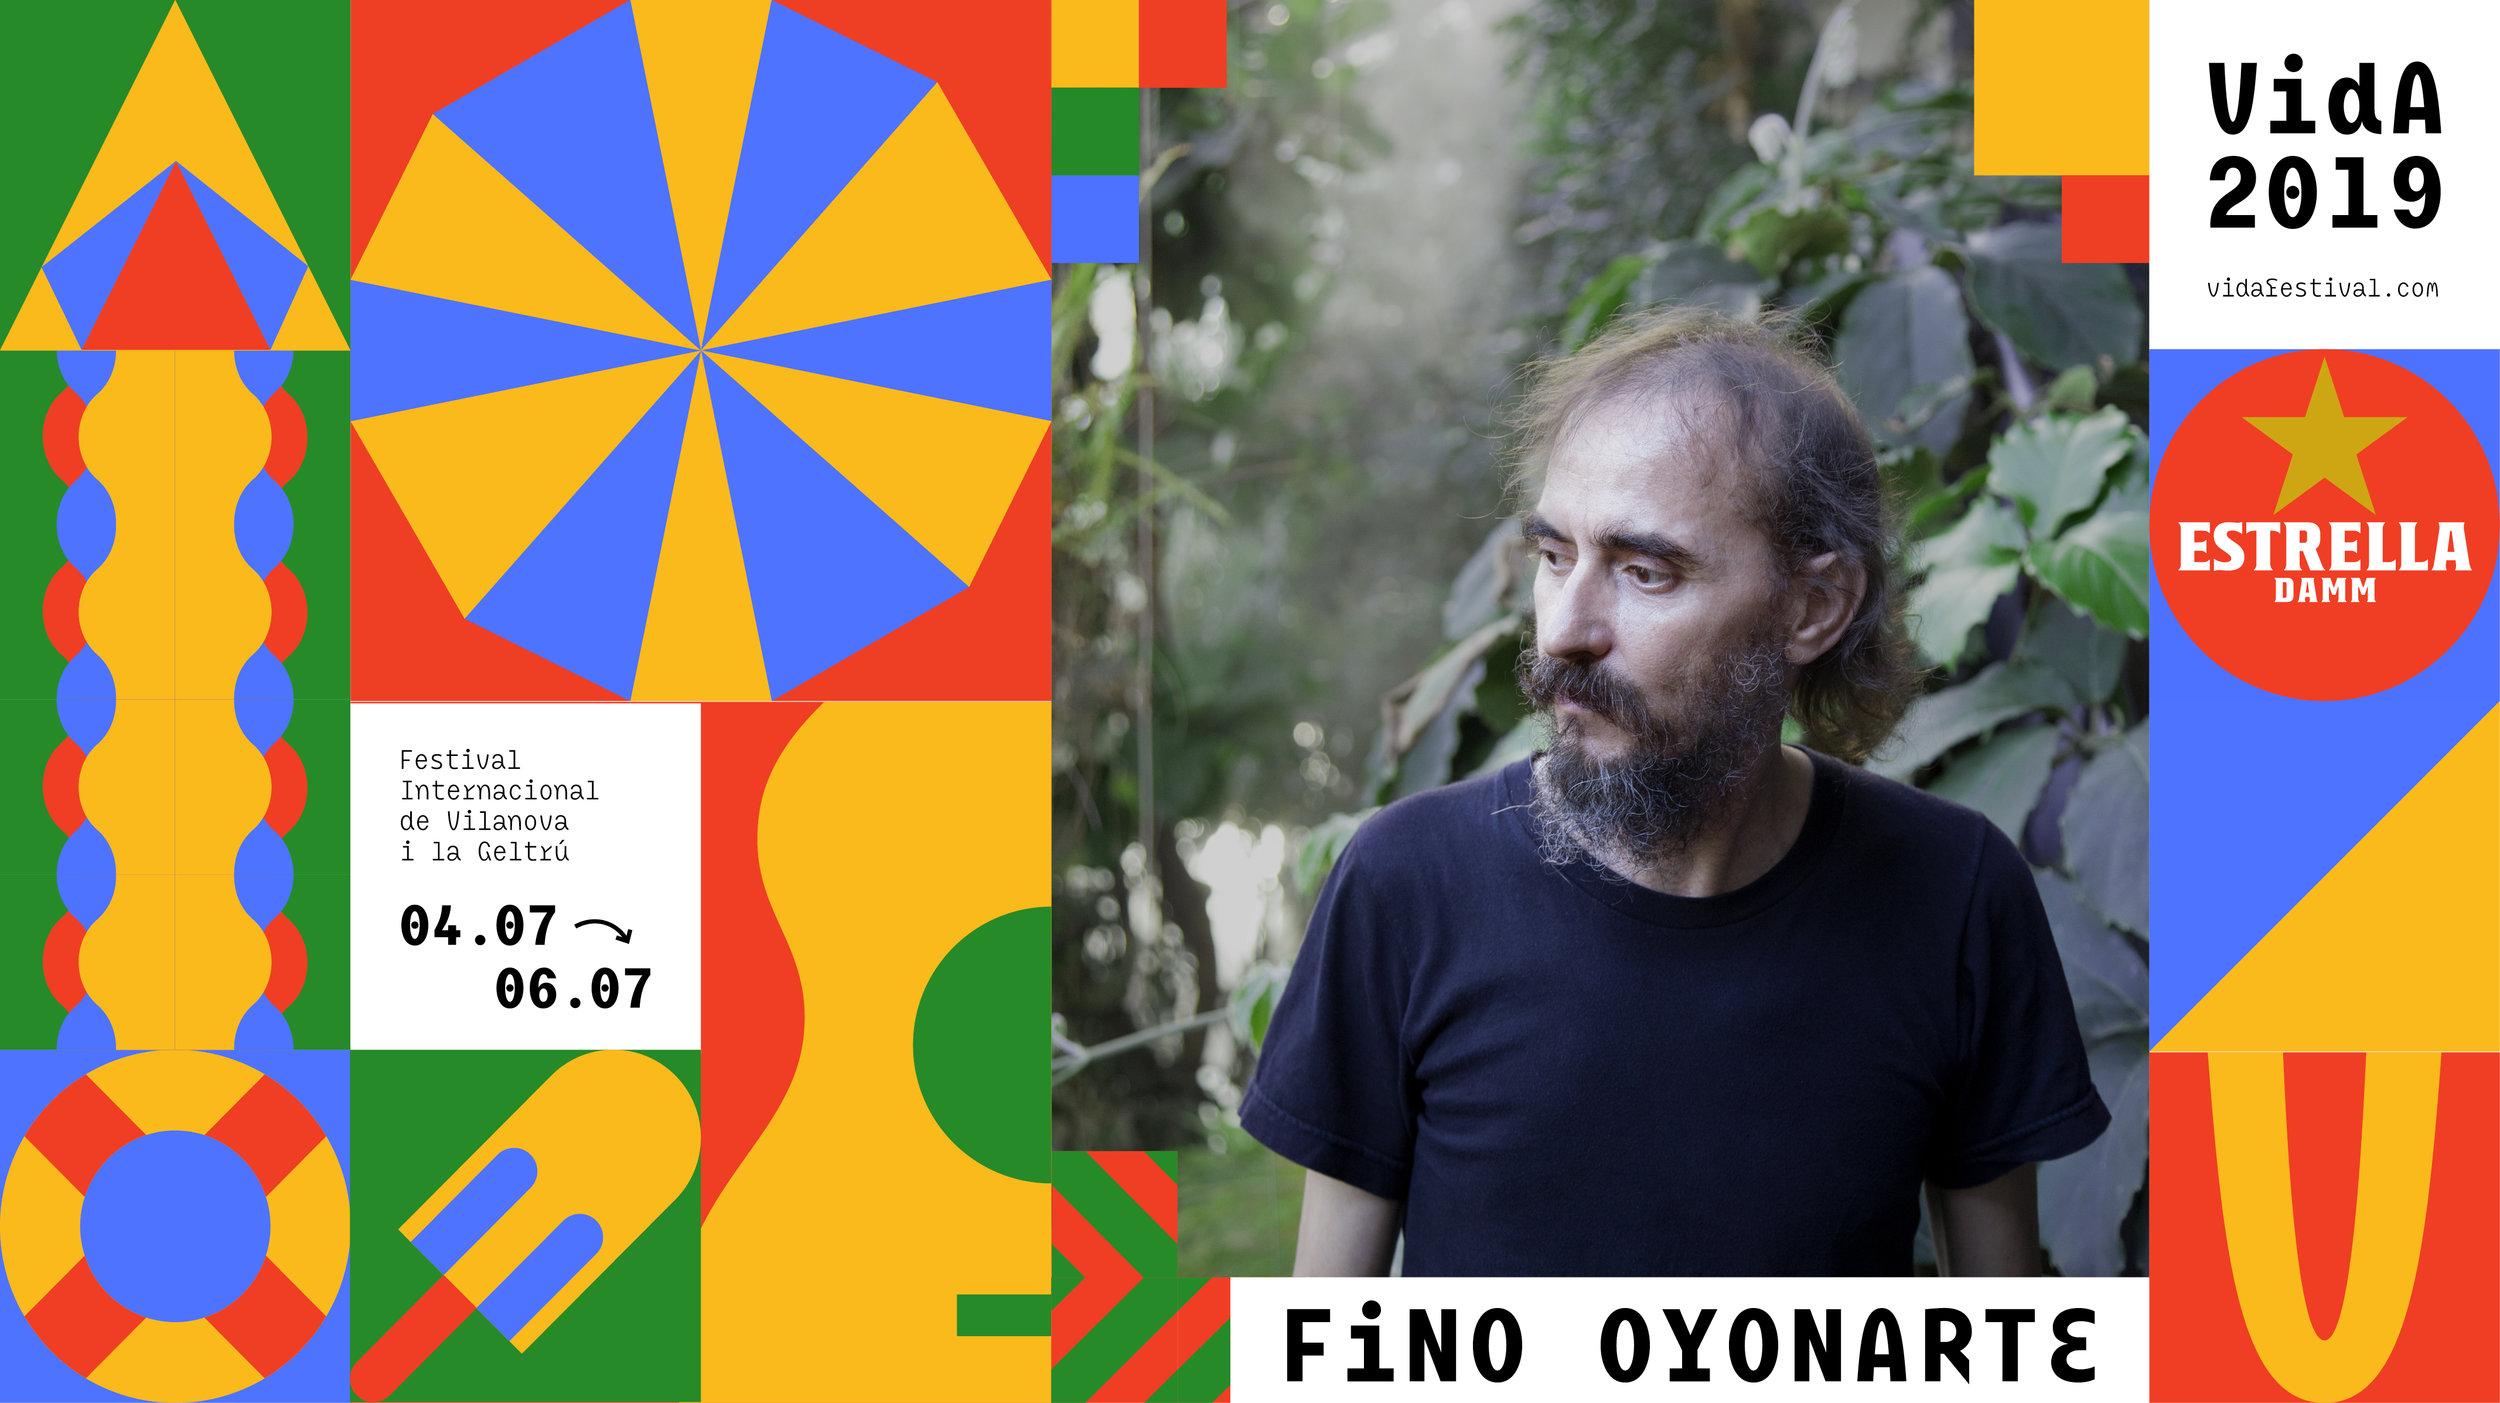 Fino Oyonarte web2.jpg